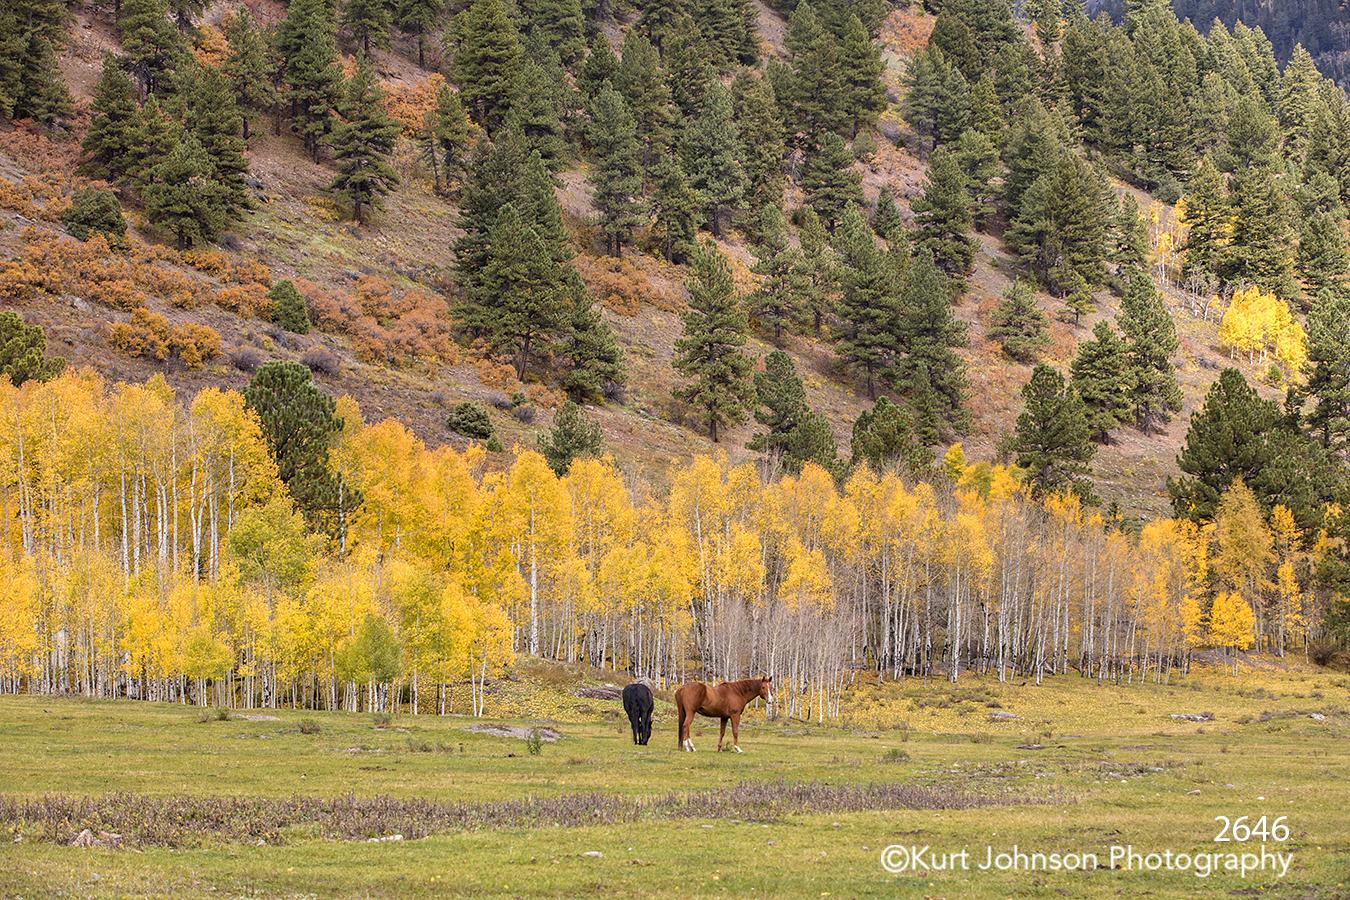 colorado landscape trees horse horses wildlife animals green grass field farm